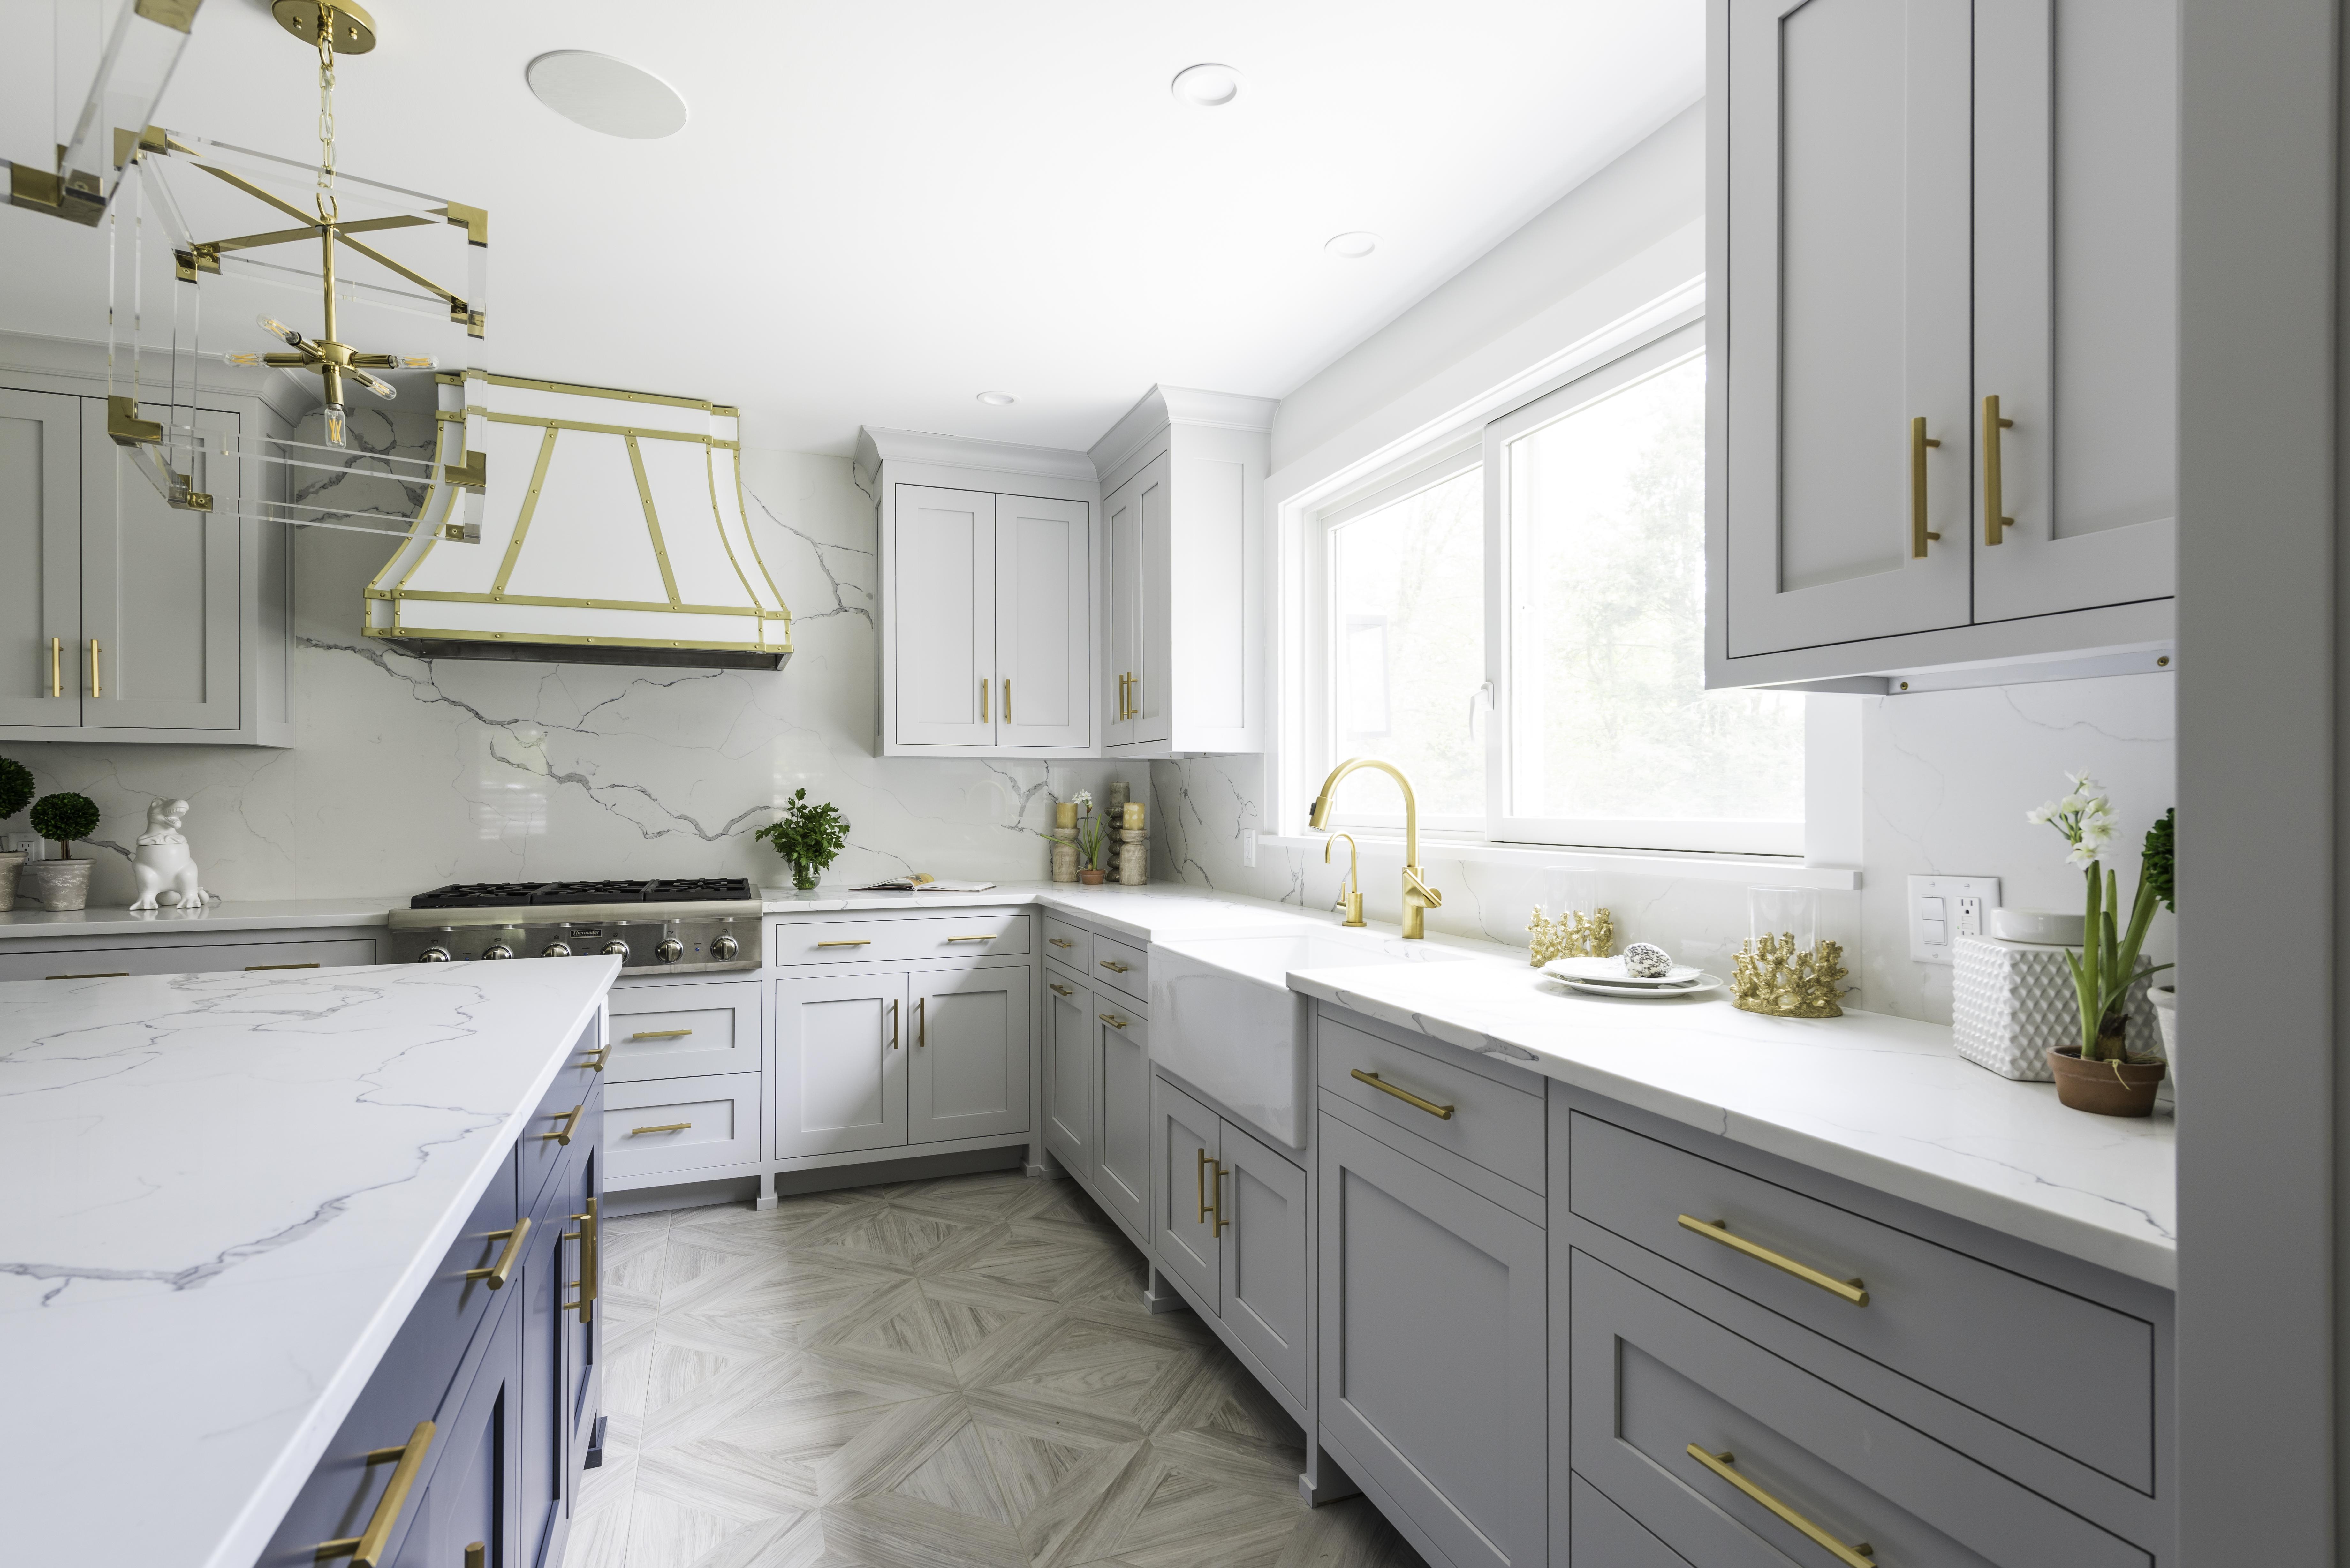 Brown Gray Travertine Stone Glass Mosaic Tile Kitchen Backsplash Sink Sample